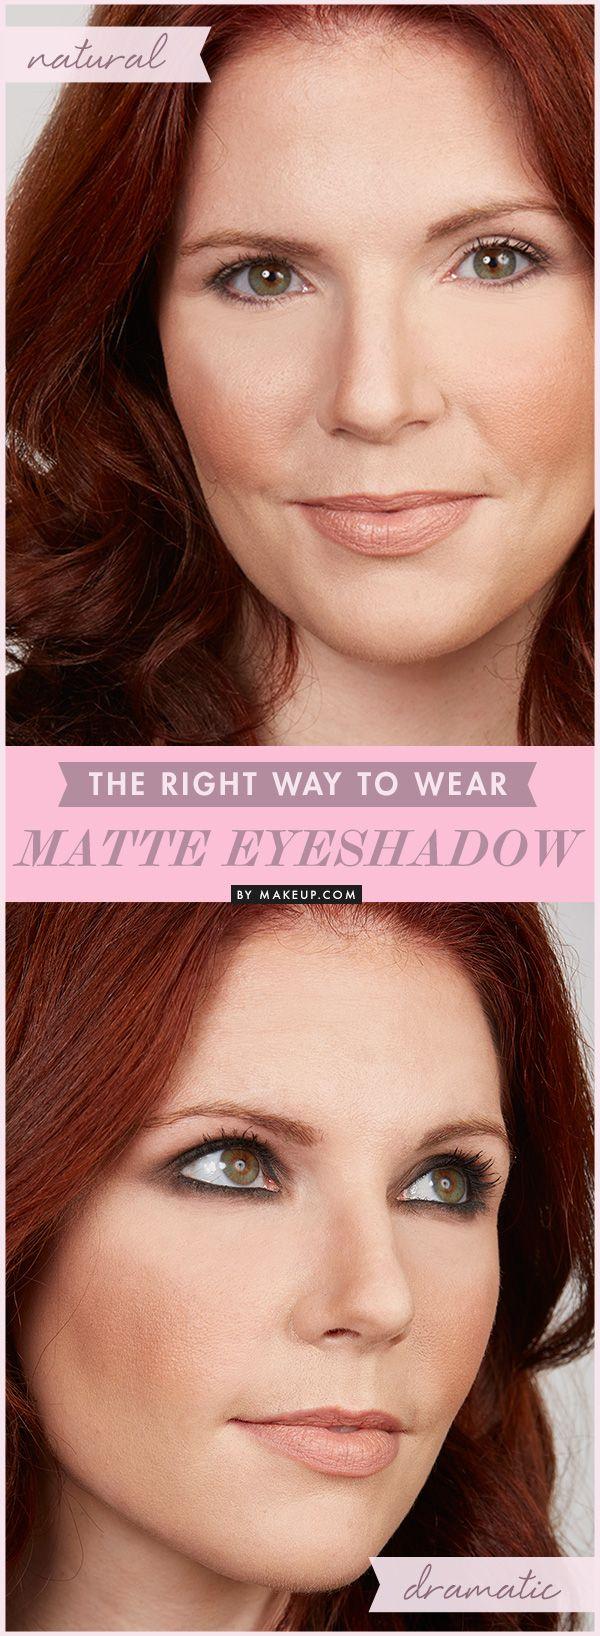 matte eyeshadow looks